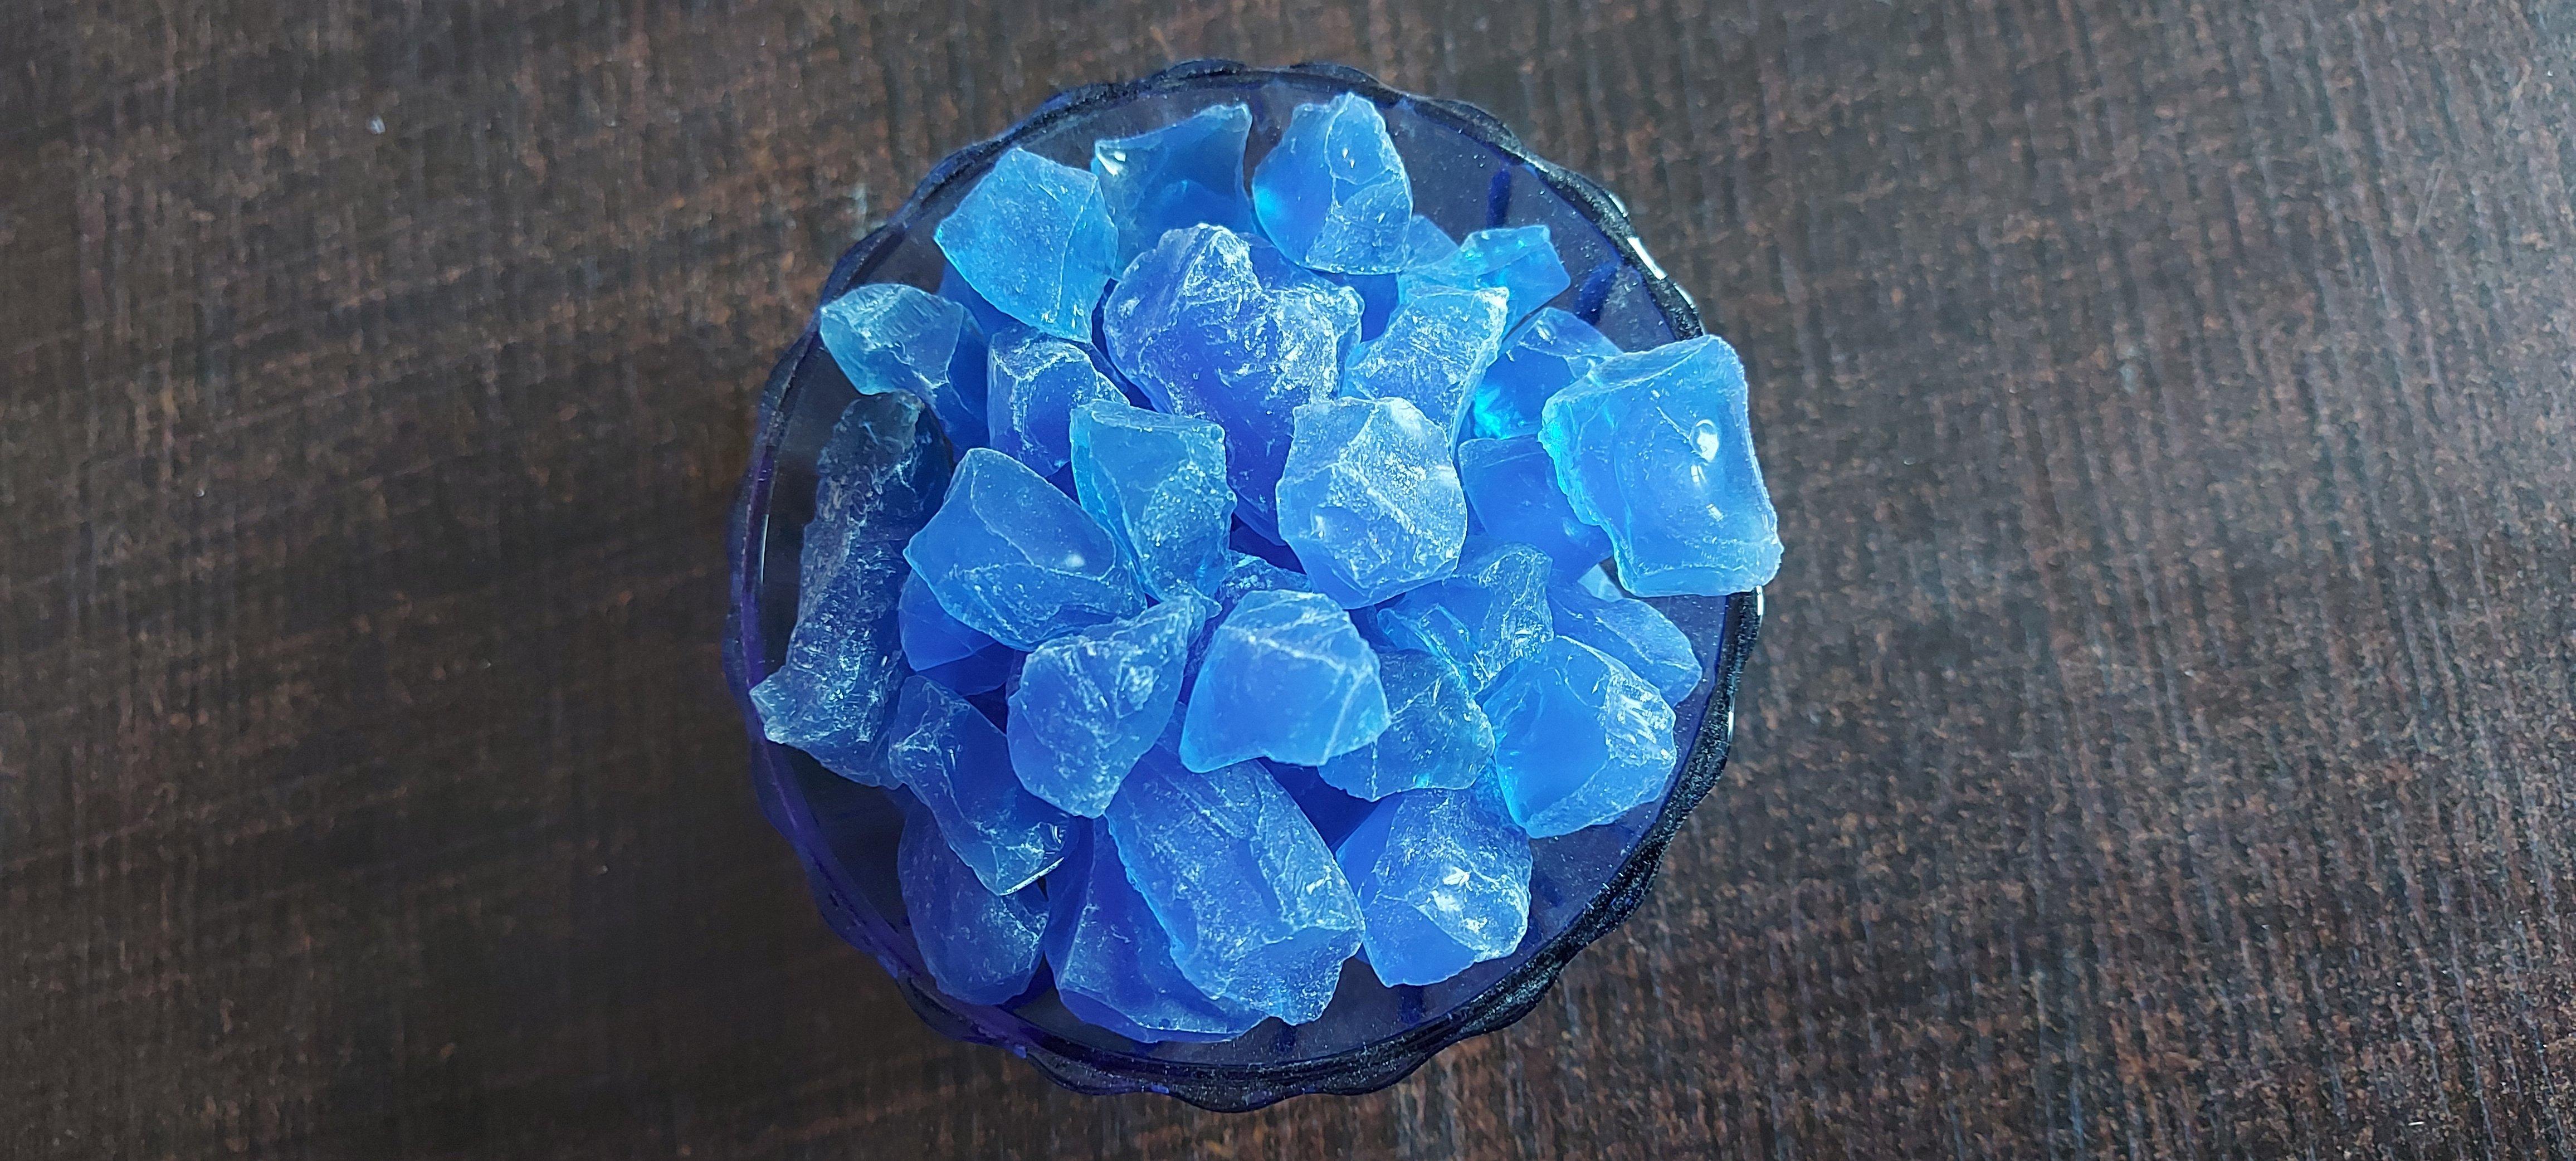 Blue Indicating Silica Gel